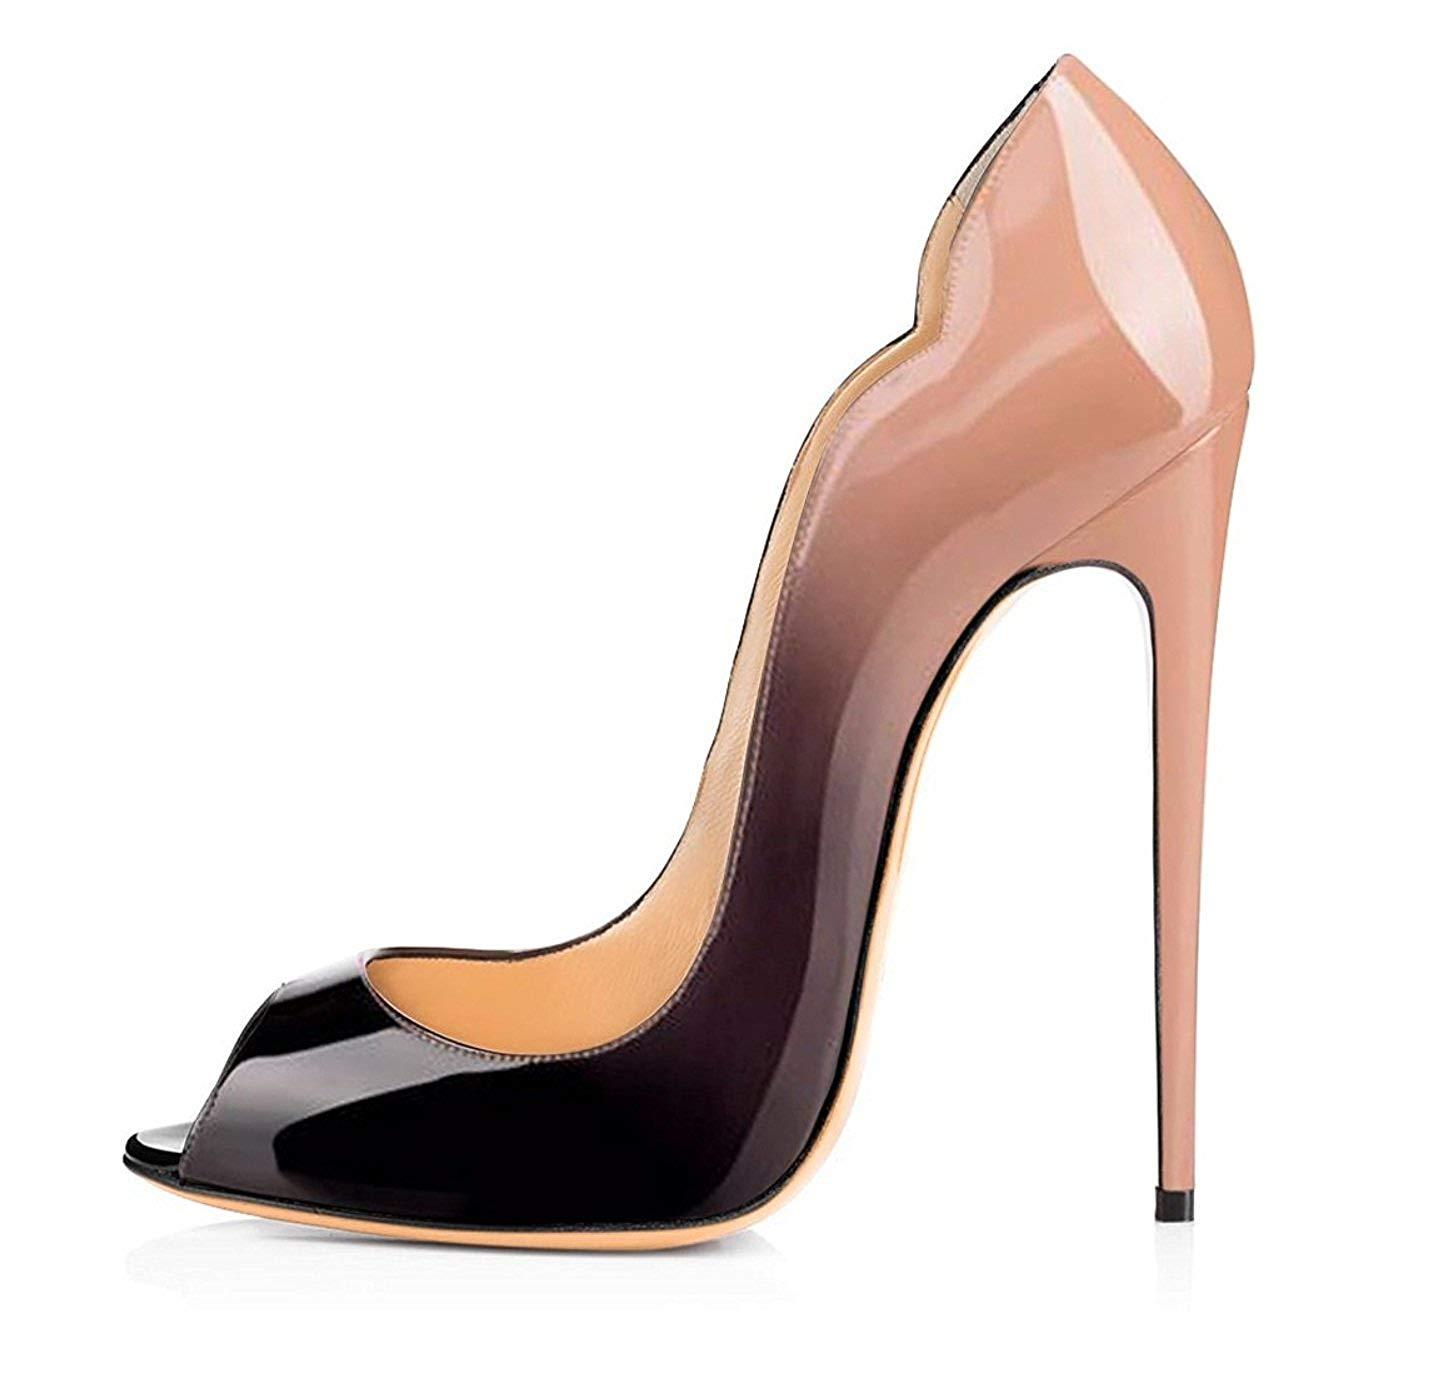 09734cbe7 Get Quotations · Eldof Womens High Heels Peep Toe Stilettos Party Sexy Heels  4